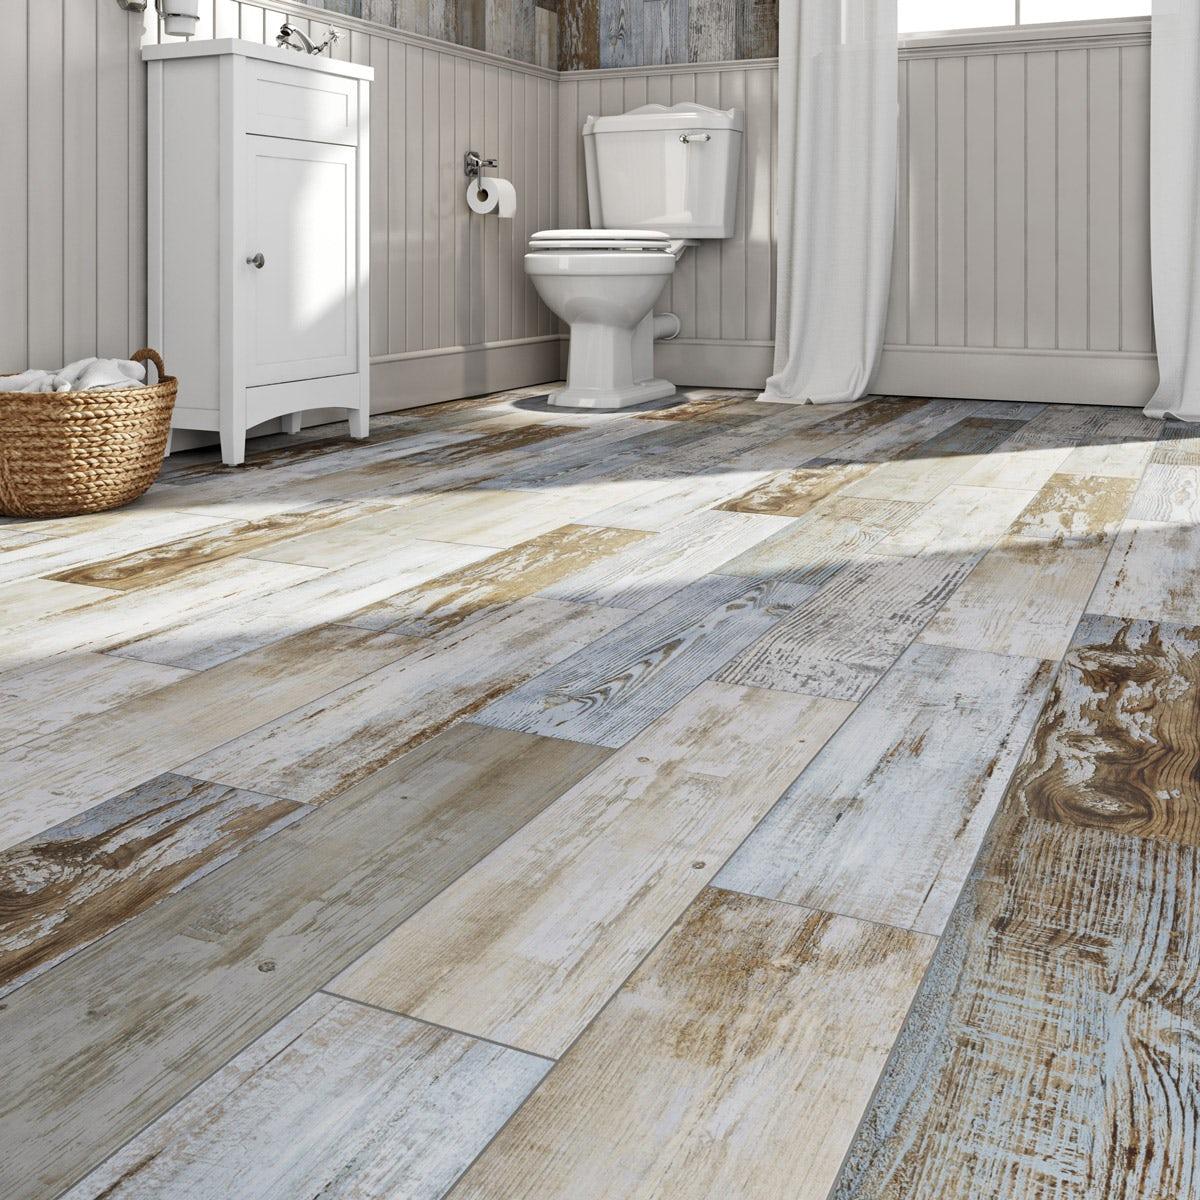 Bathroom Flooring Wood Effect Image